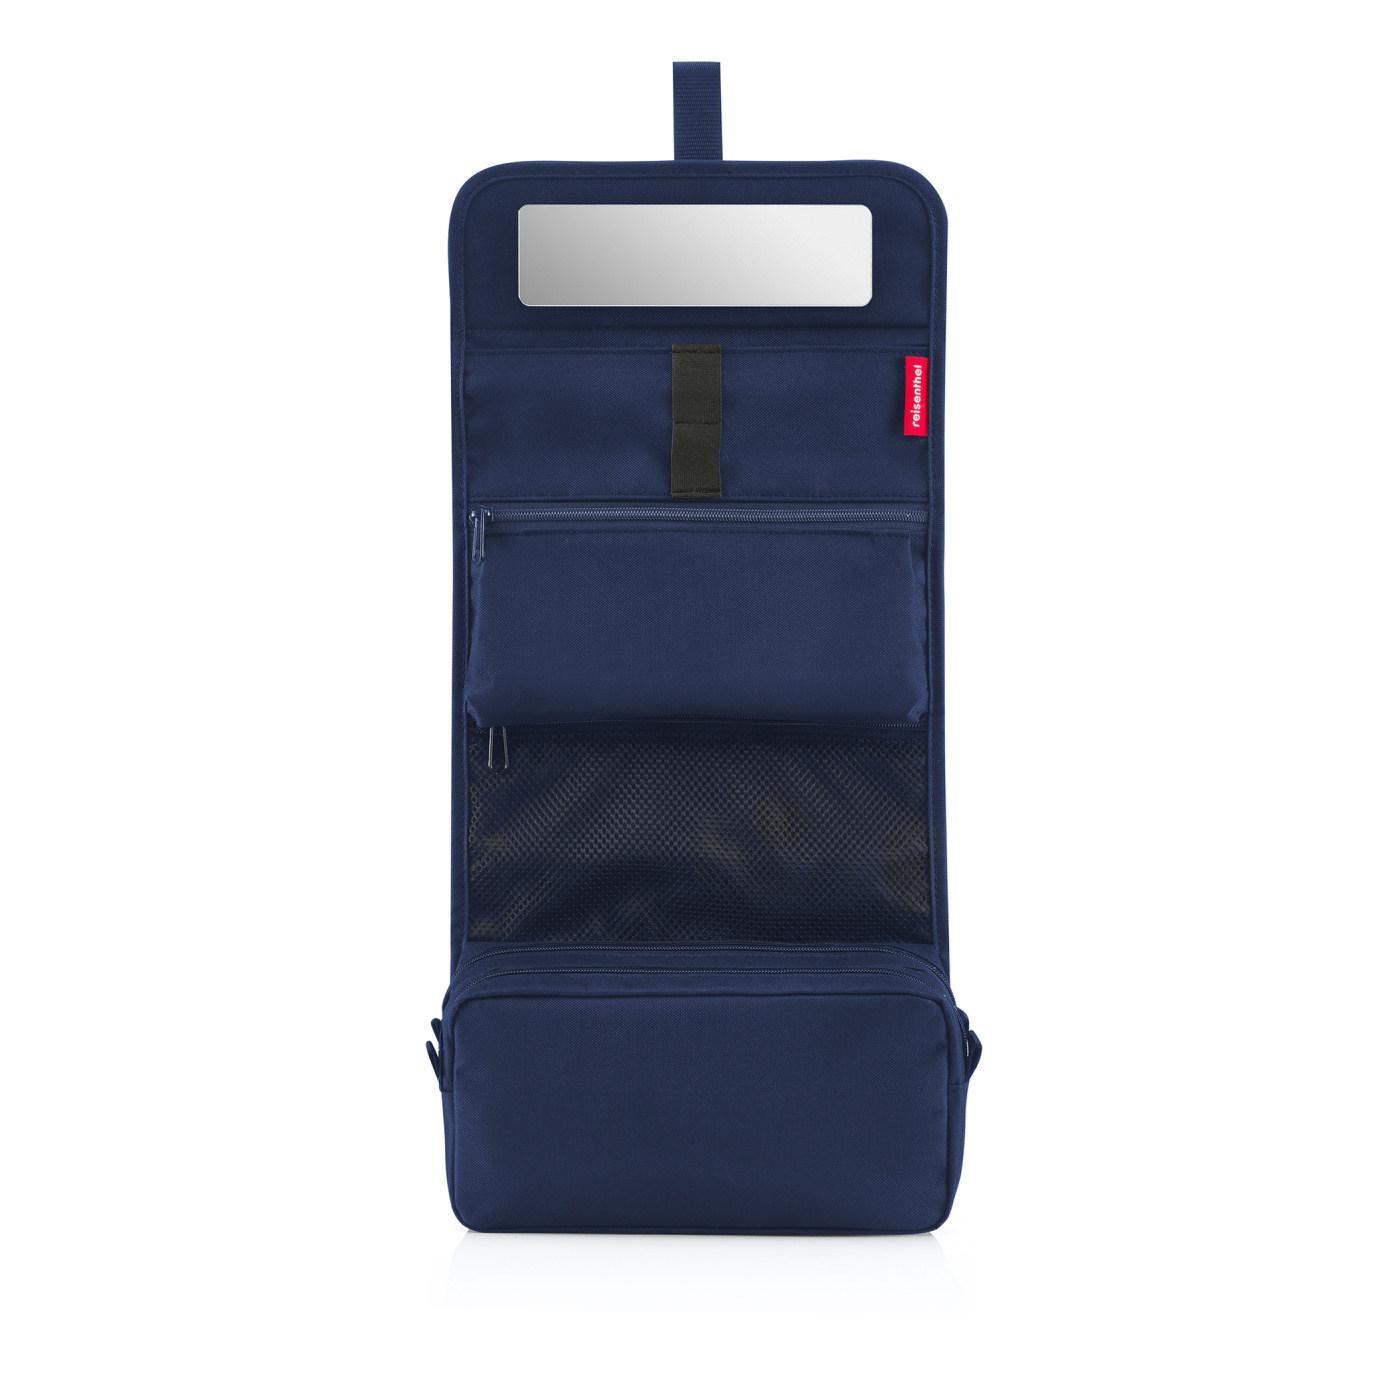 Kosmetická taška Wrapcosmetic navy_1